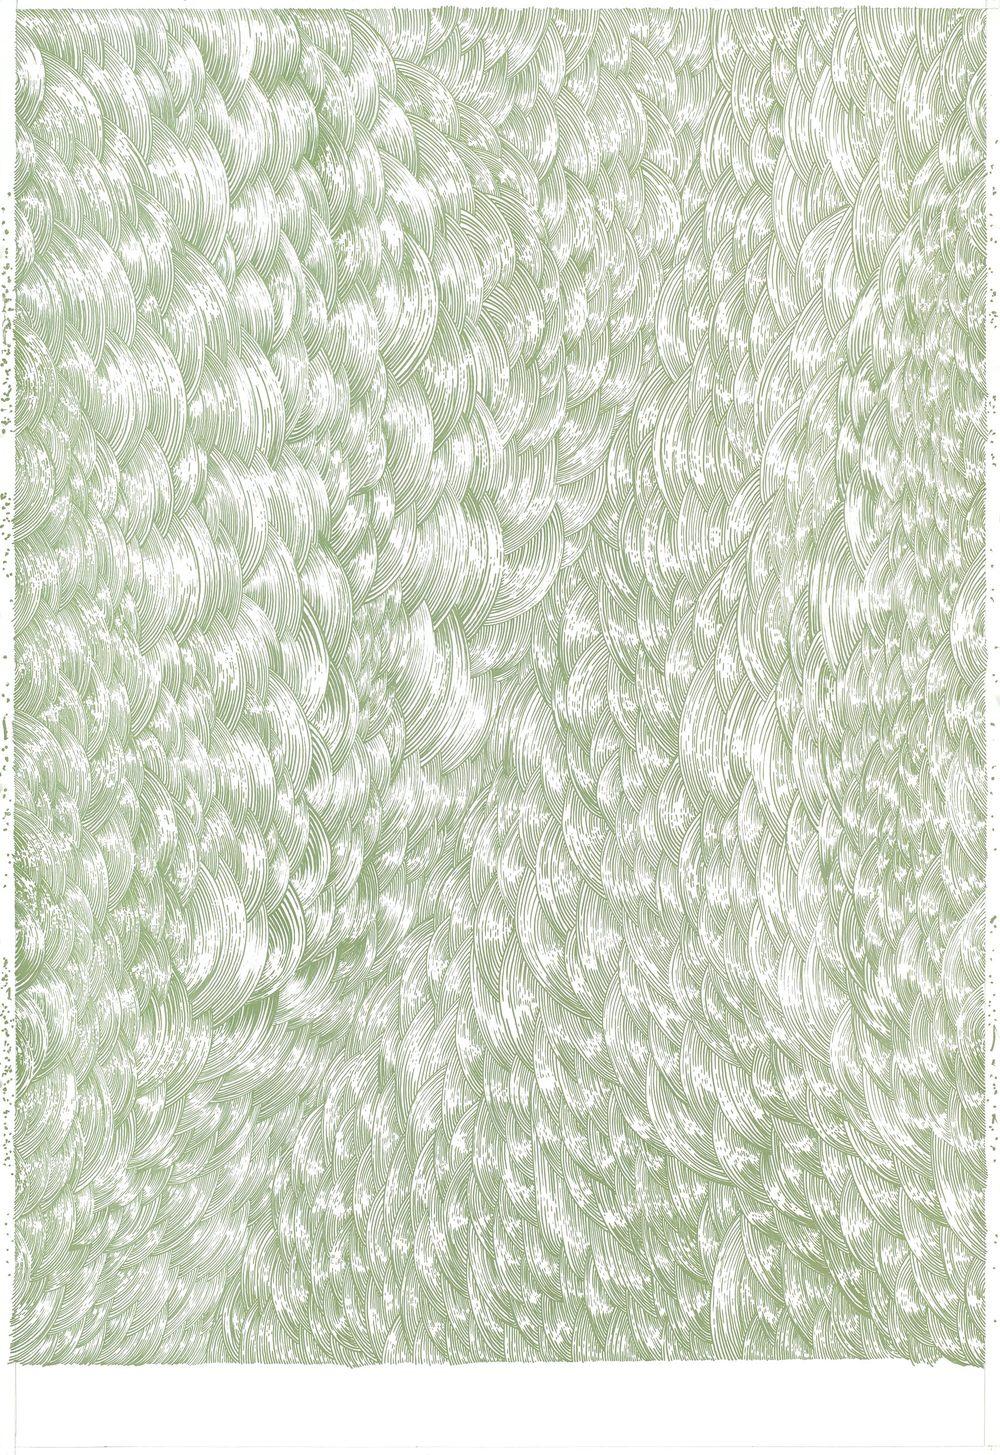 BK P136 | acrylic on paper | 150x103cm | 2013